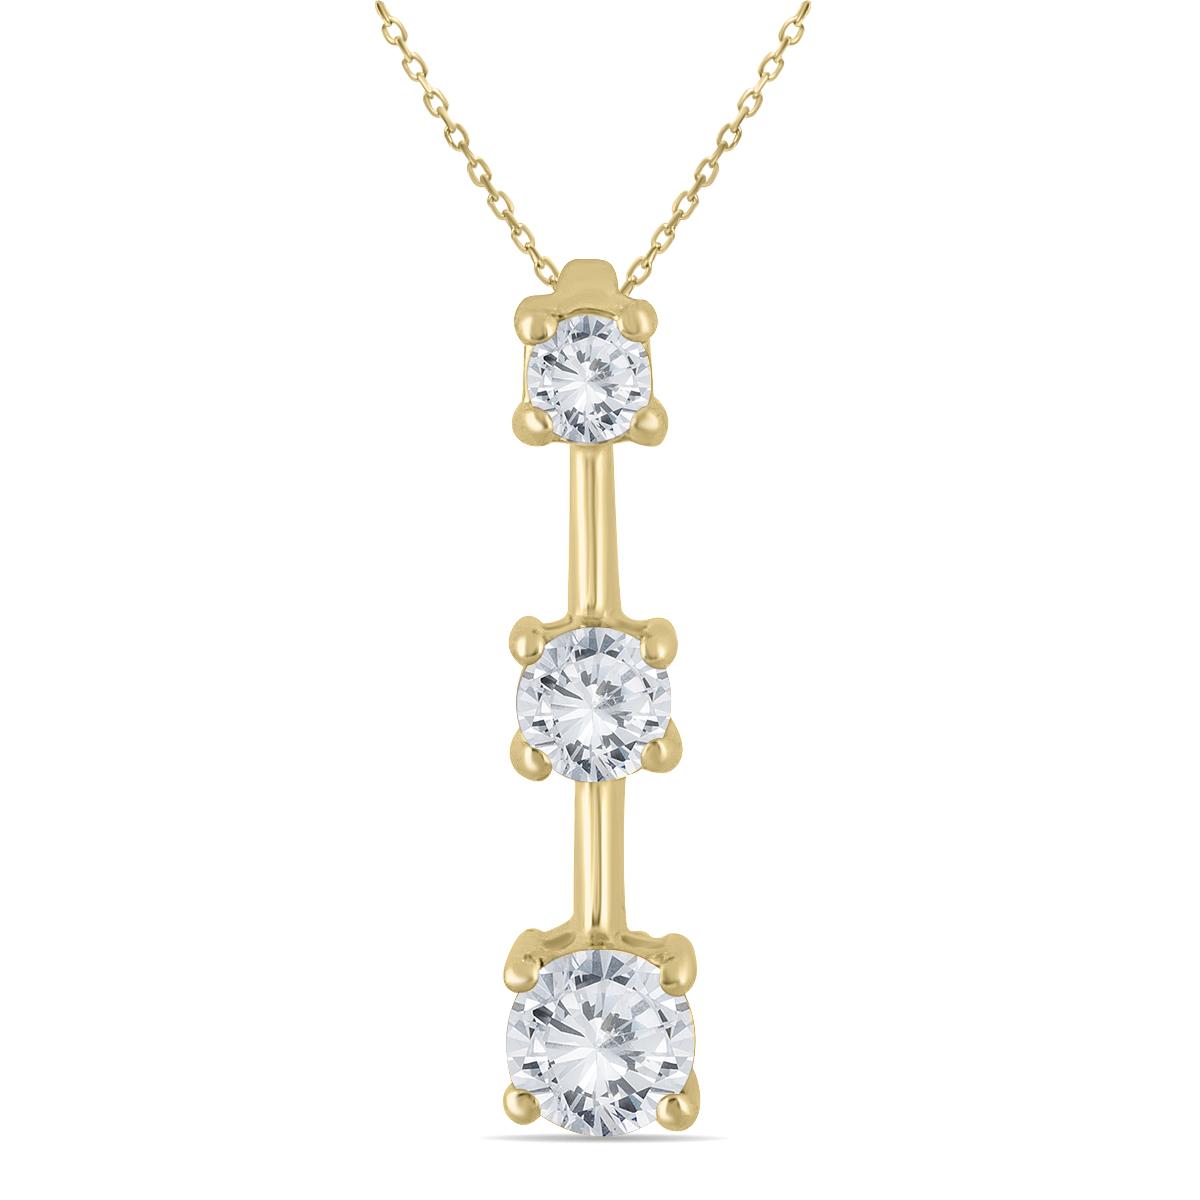 1 Carat TW Three Stone Diamond Pendant in 14K Yellow Gold